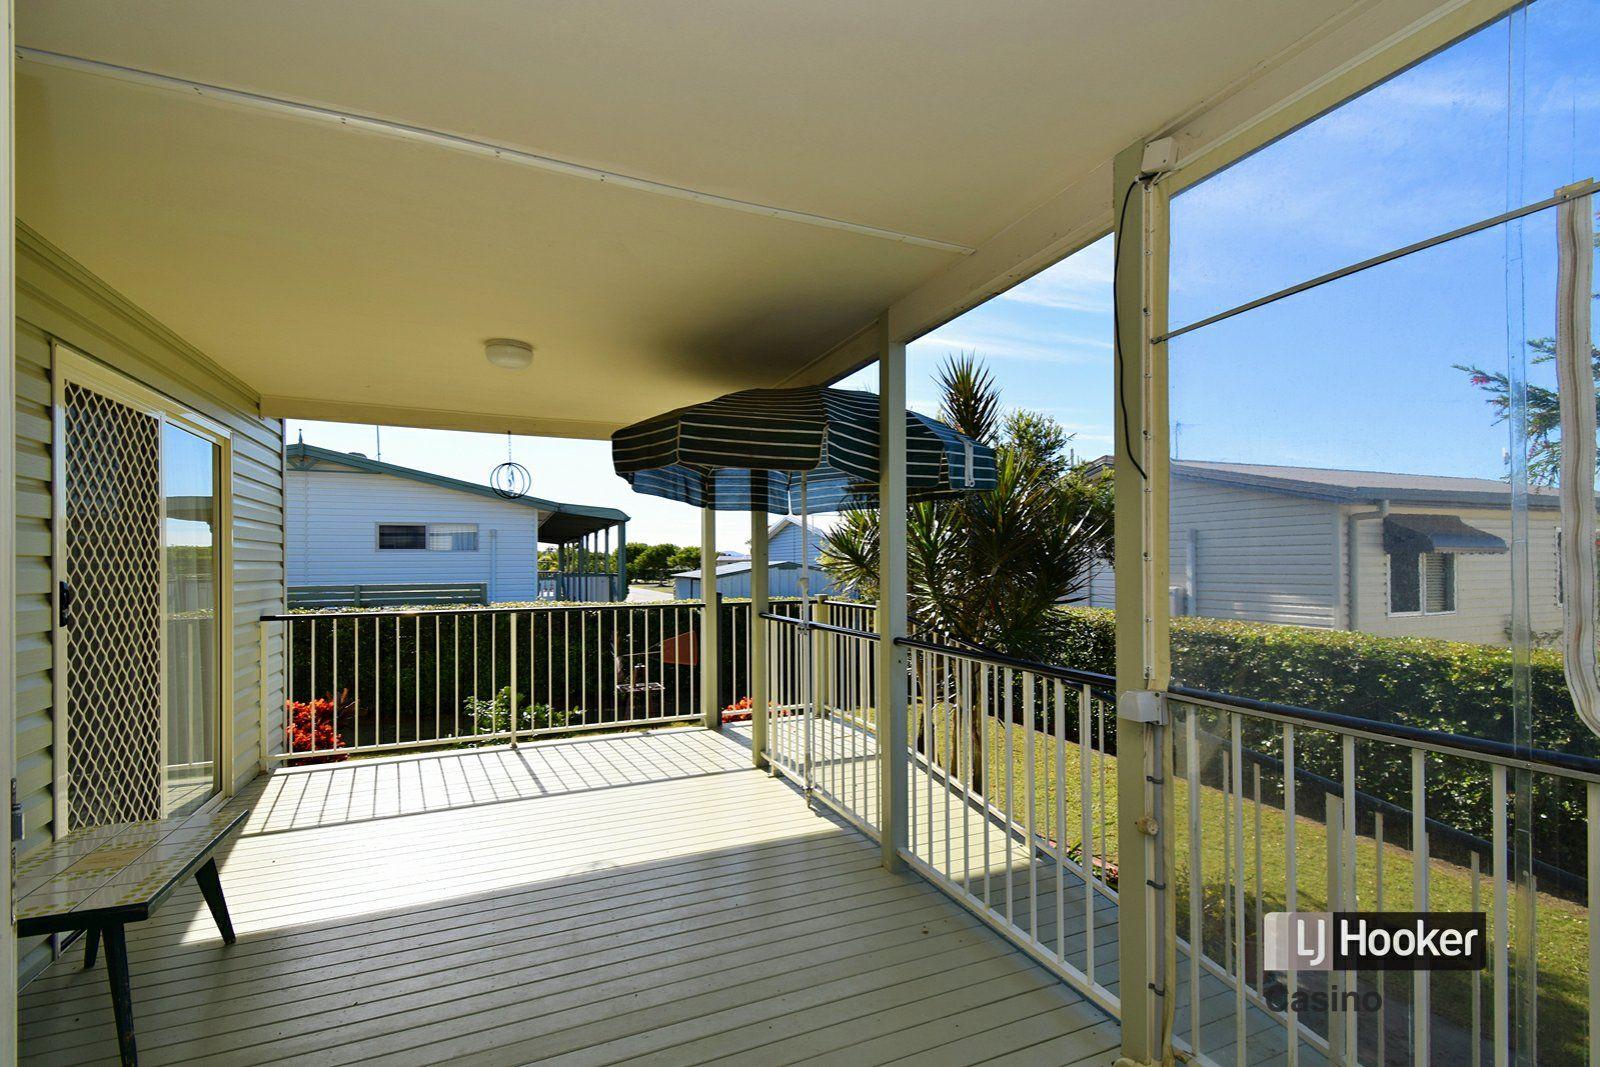 32/69 Blue wren Way/Light street, Casino NSW 2470, Image 1